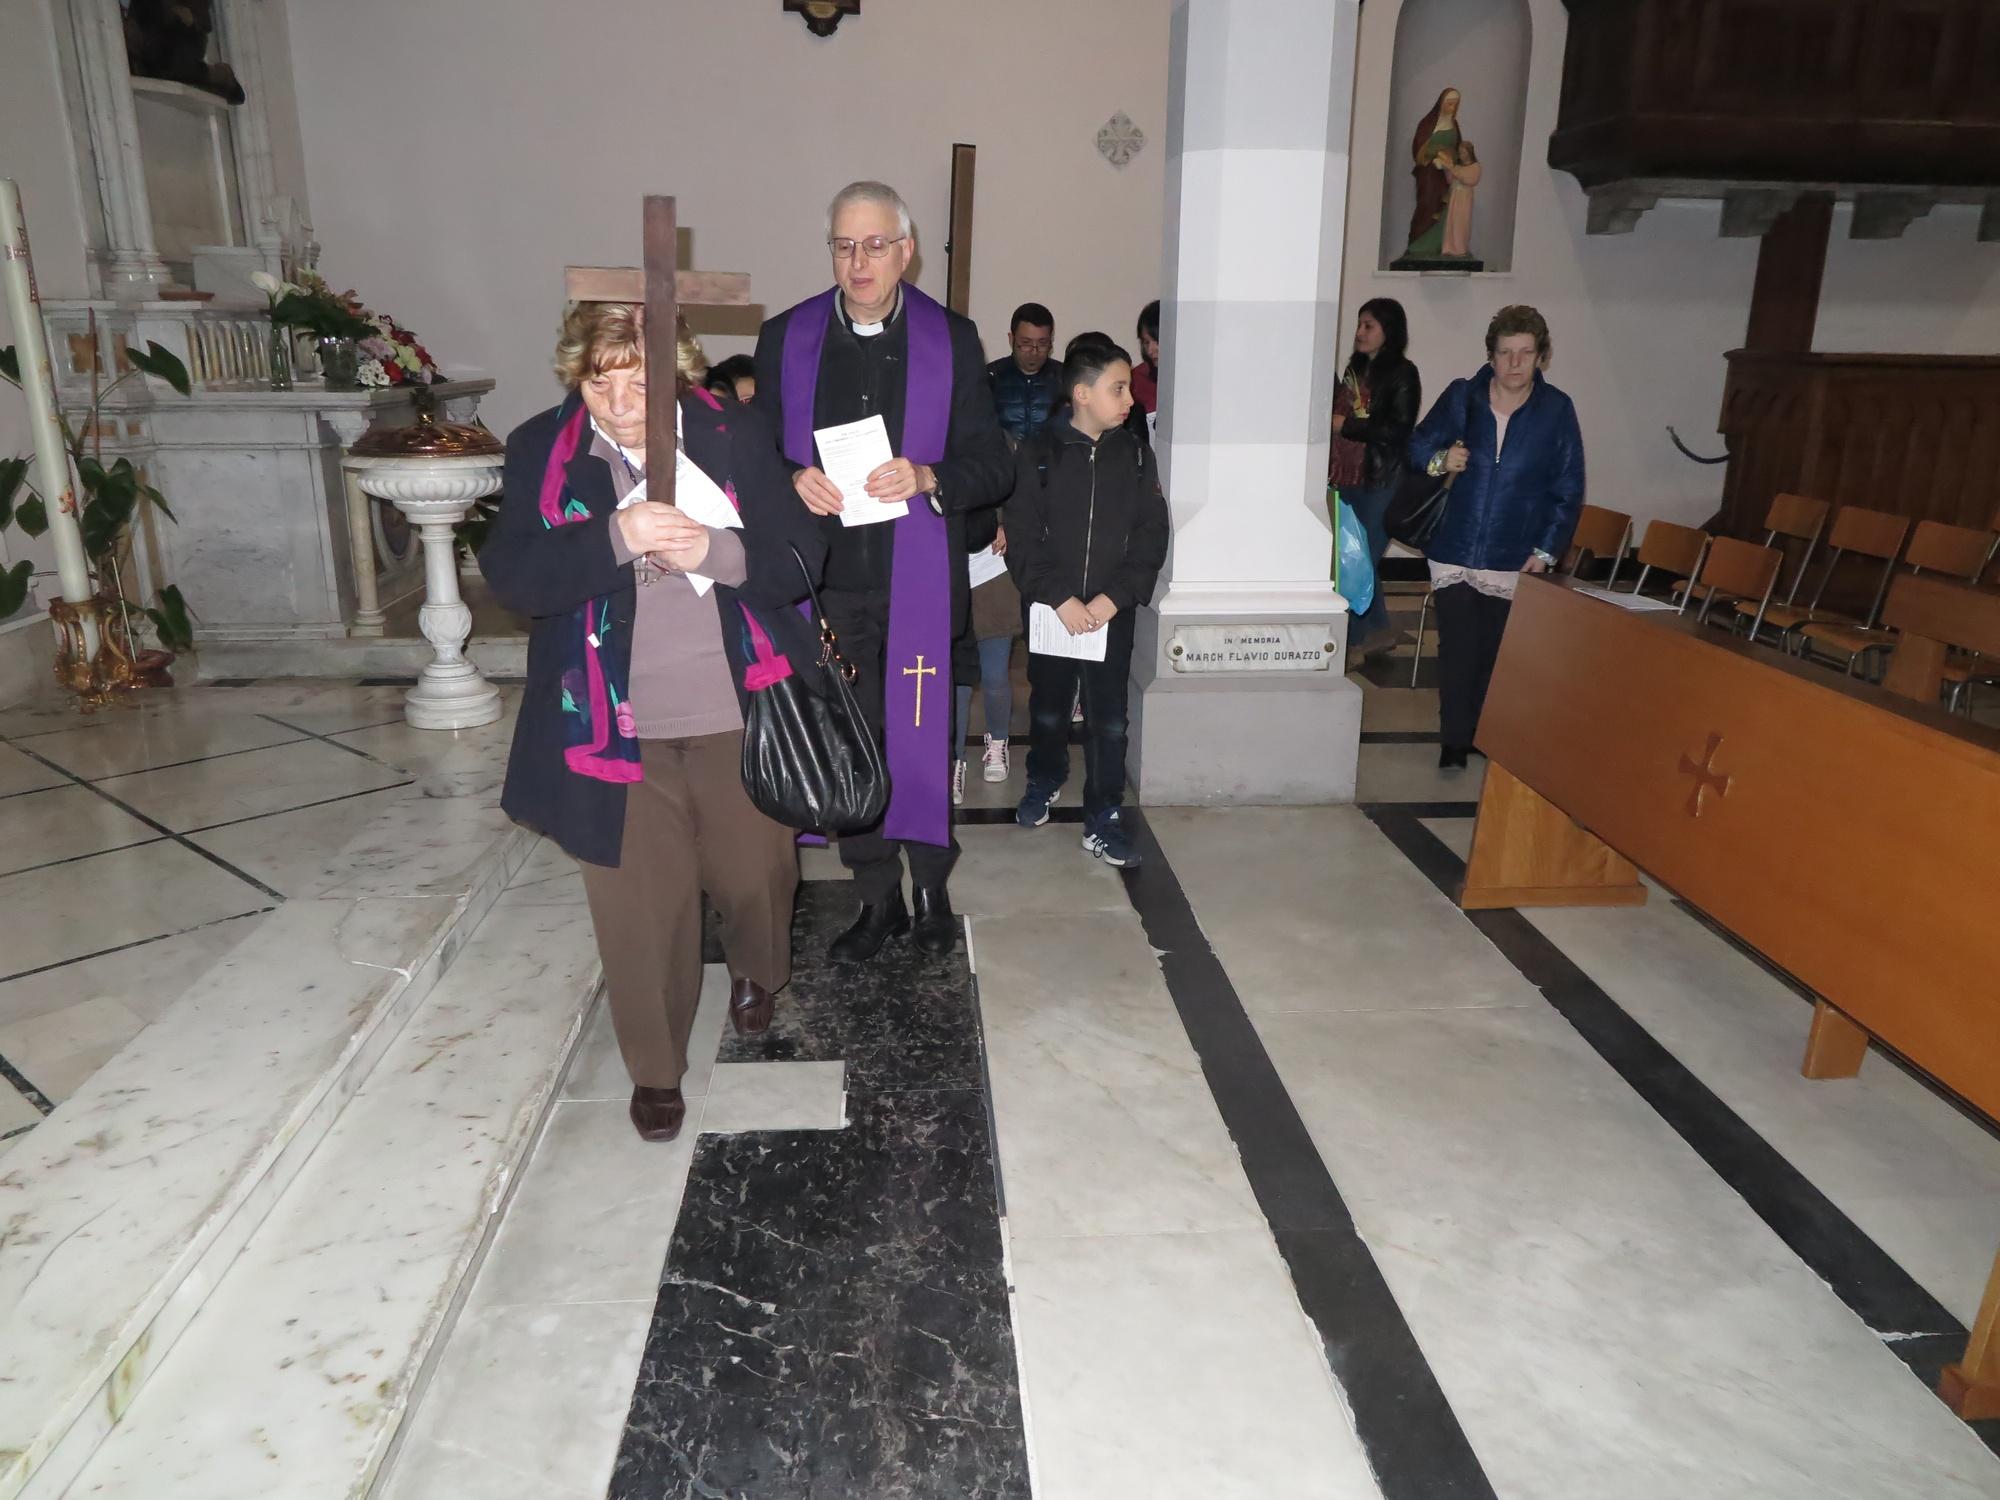 via-crucis-catechismo-2016-03-20-10-28-49